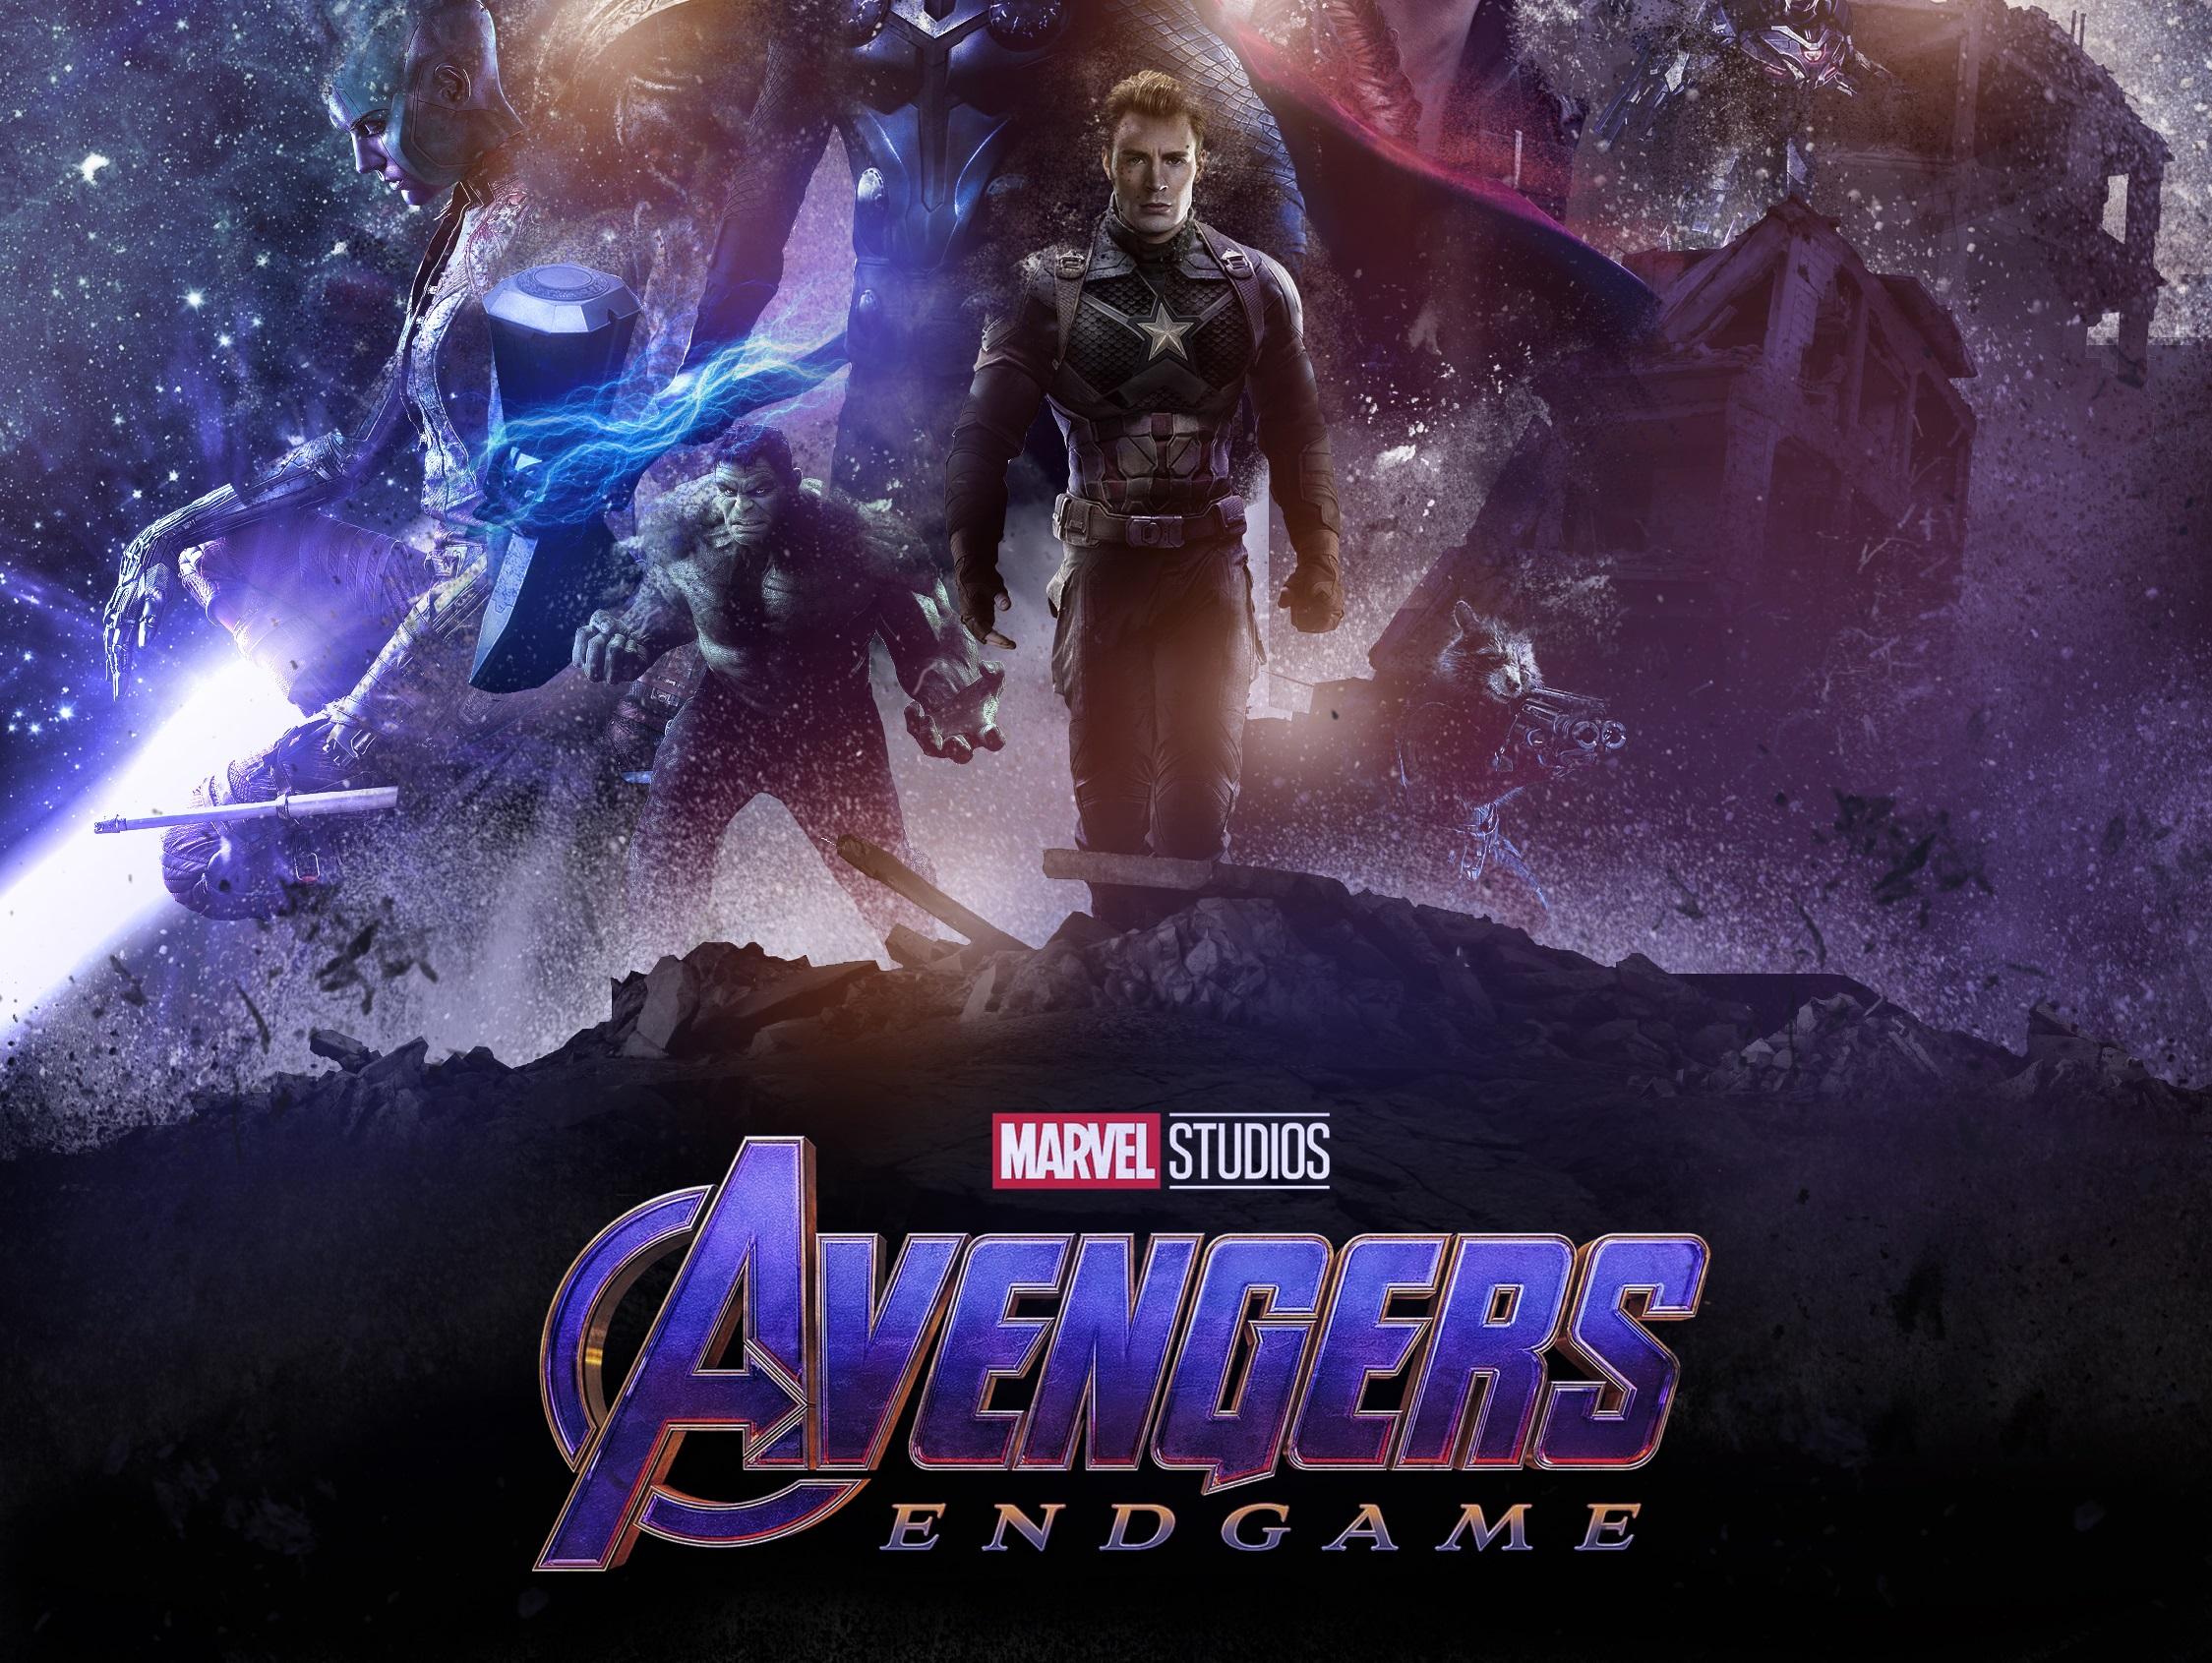 Avengers Endgame Hd Wallpaper Background Image 2249x1691 Id